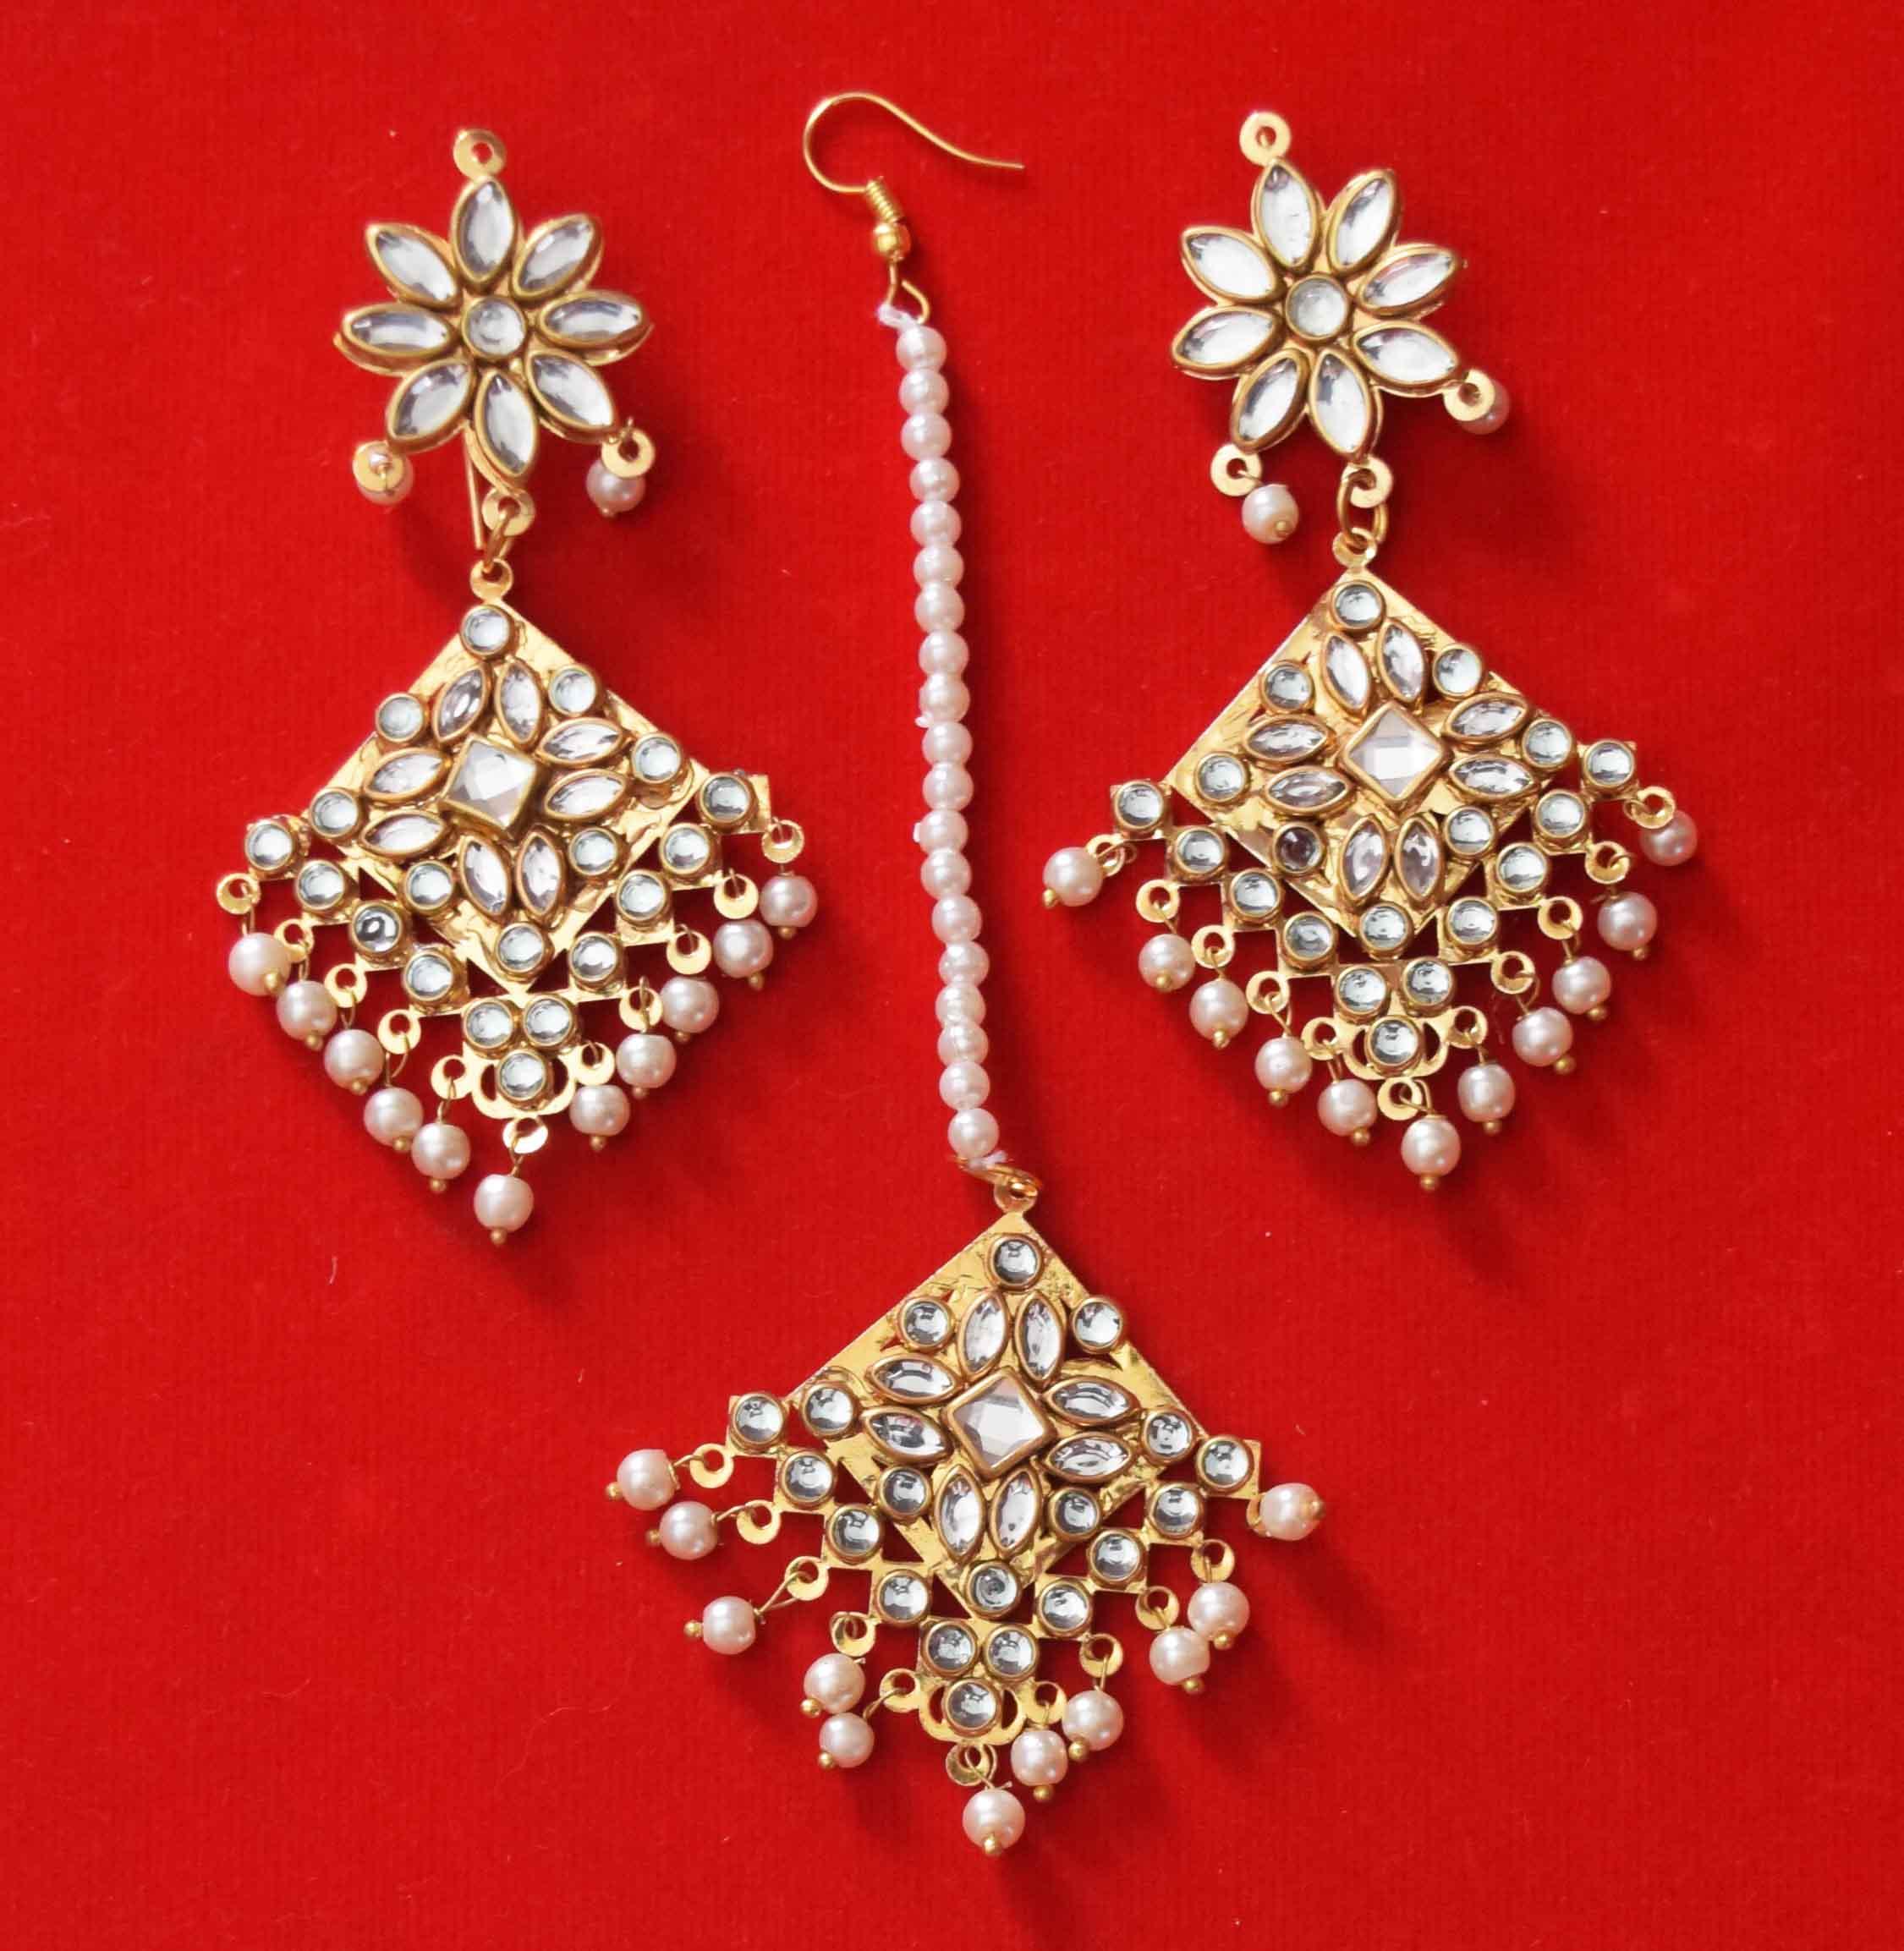 Kundan Work Punjabi Traditional Jewellery Earrings Tikka set J0468 1